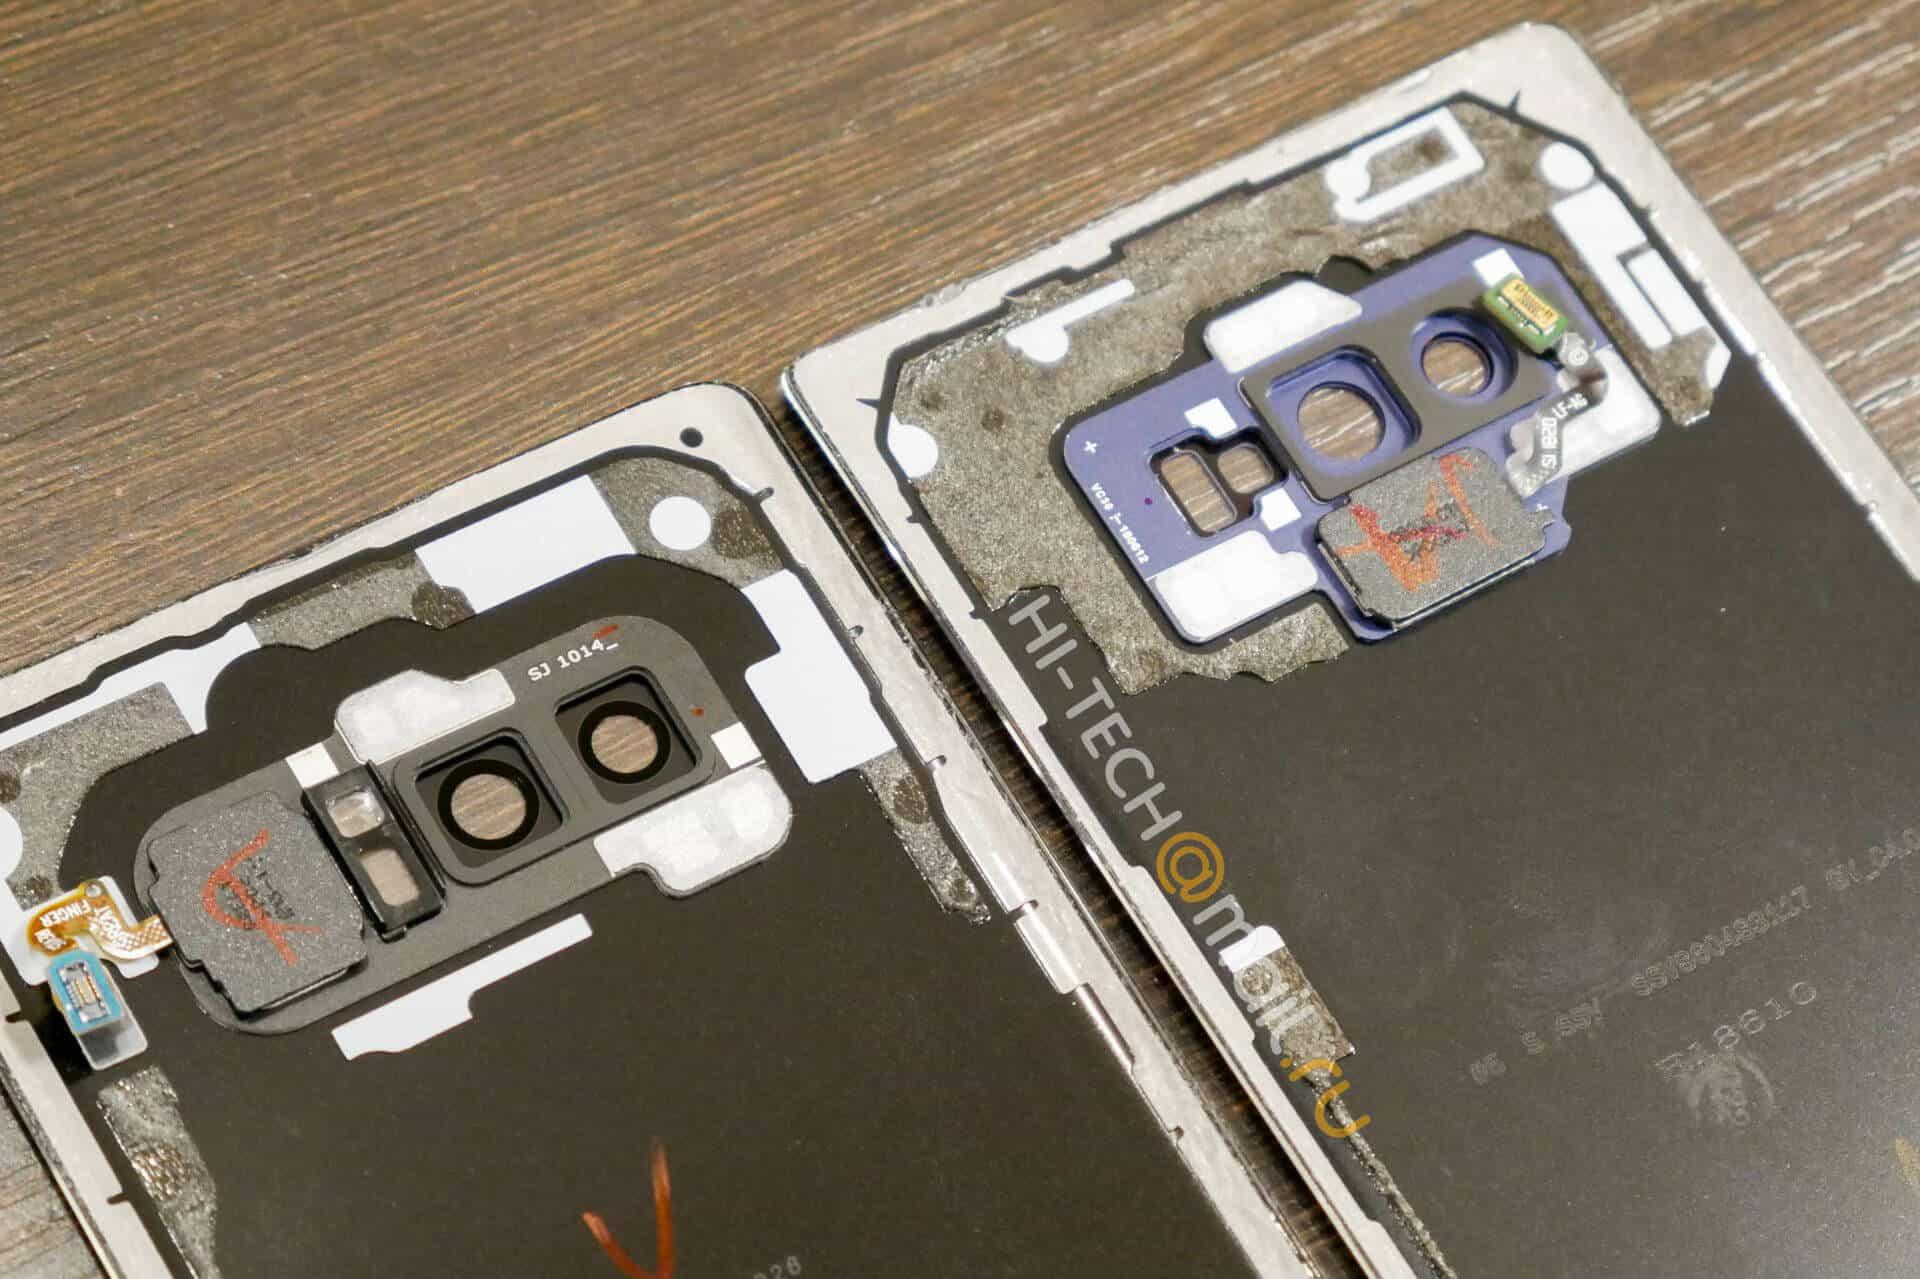 Galaxy Note 8 v Galaxy Note 9 teardown from Hi Tech Mail RU 04